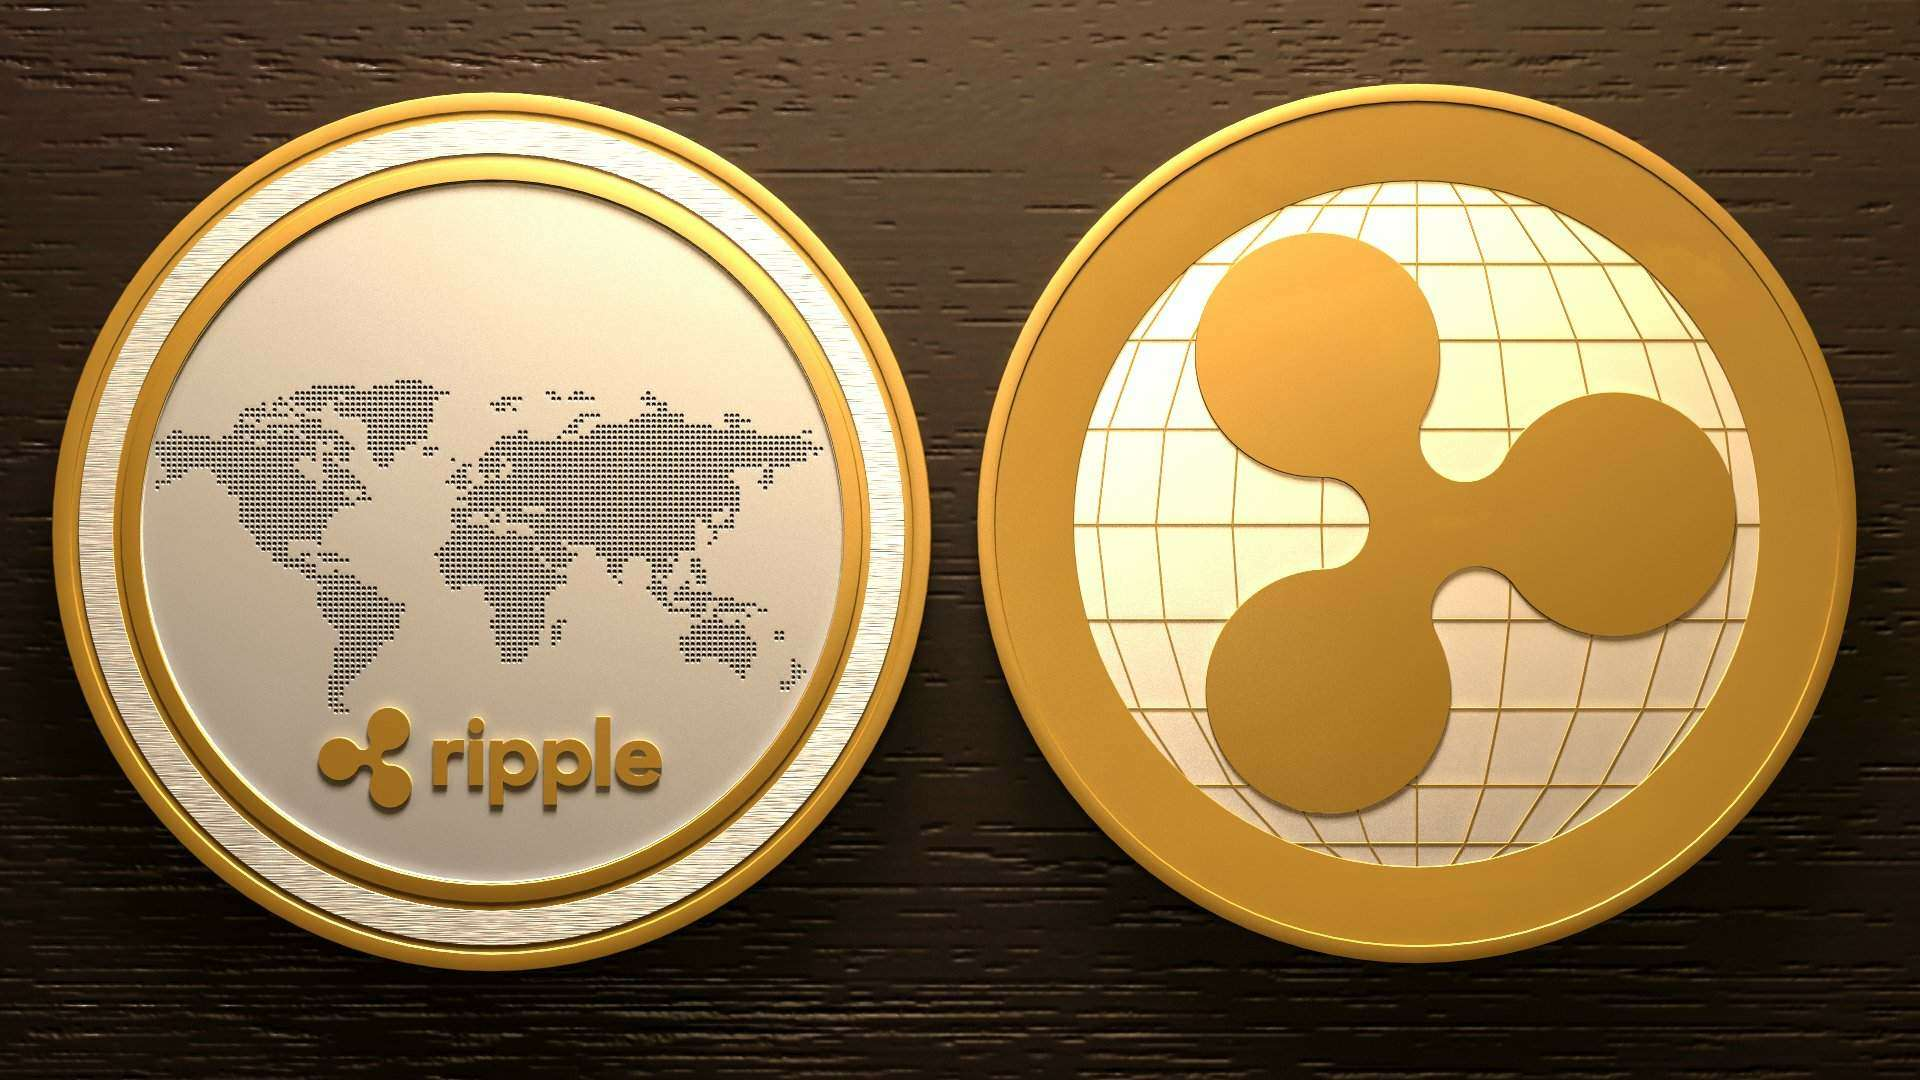 Ripple(リップル) Rippled Coindelta cointal